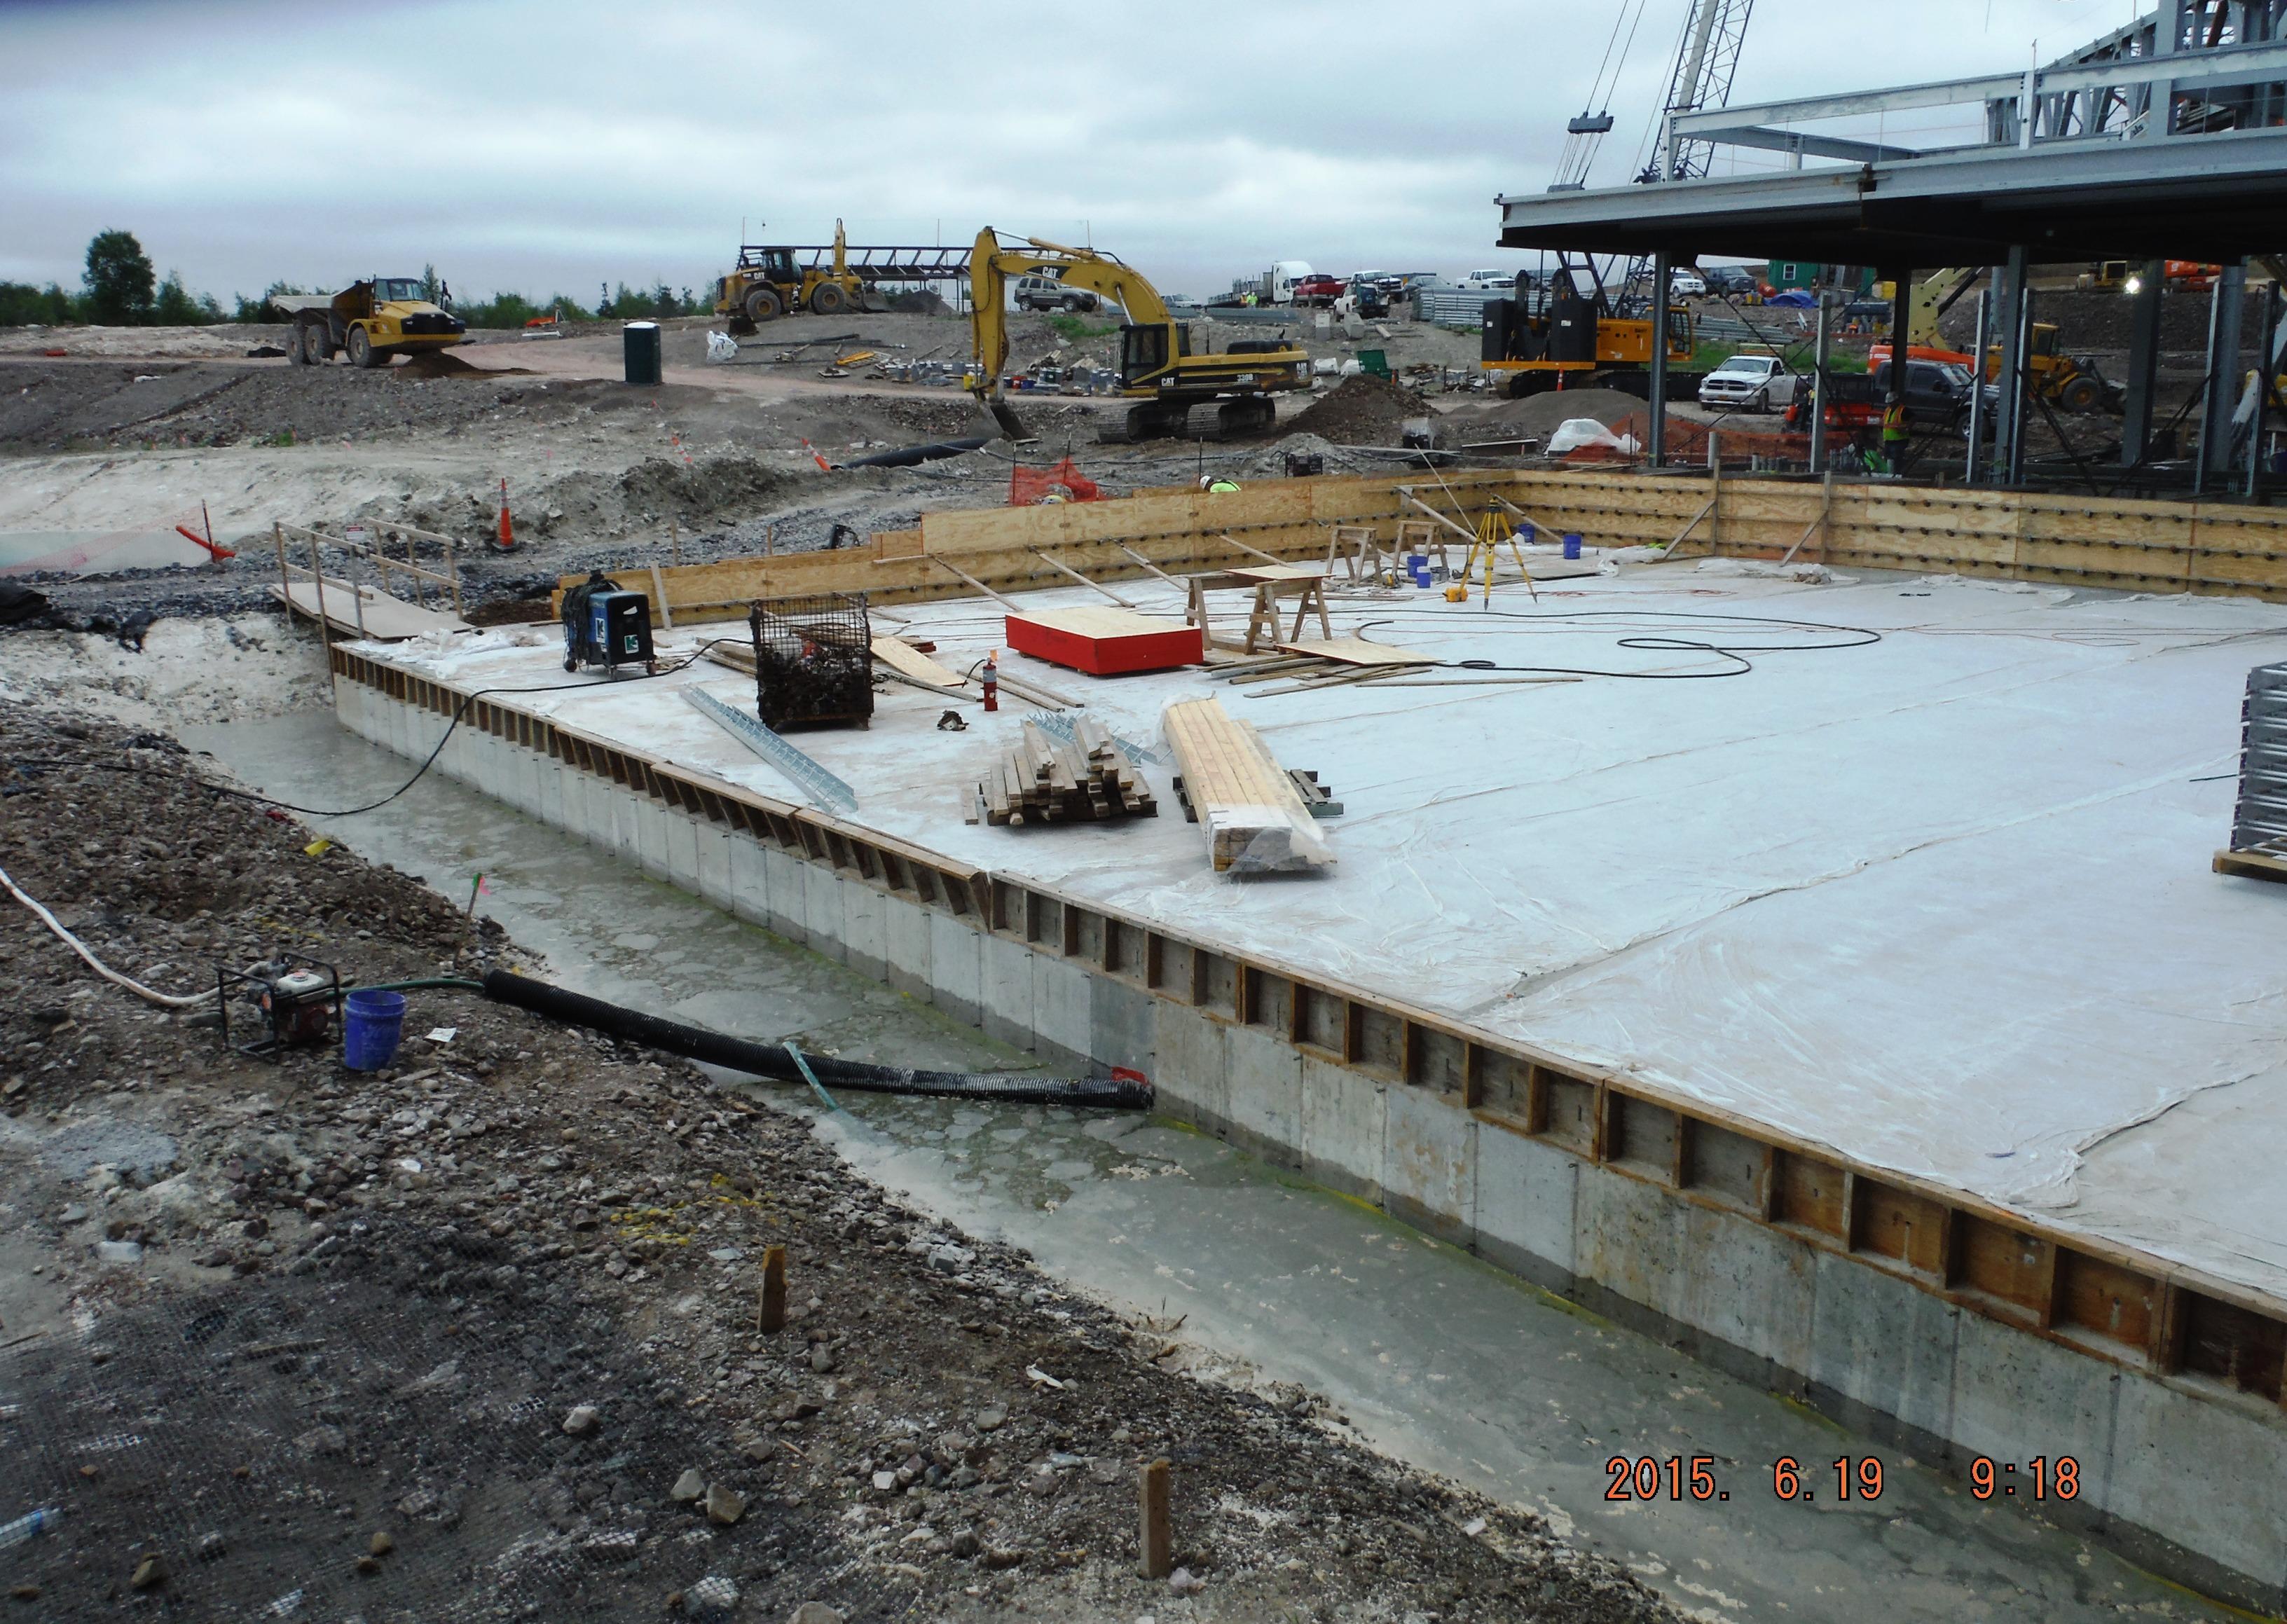 John P. Stopen Lakeview Amphitheater Project construction